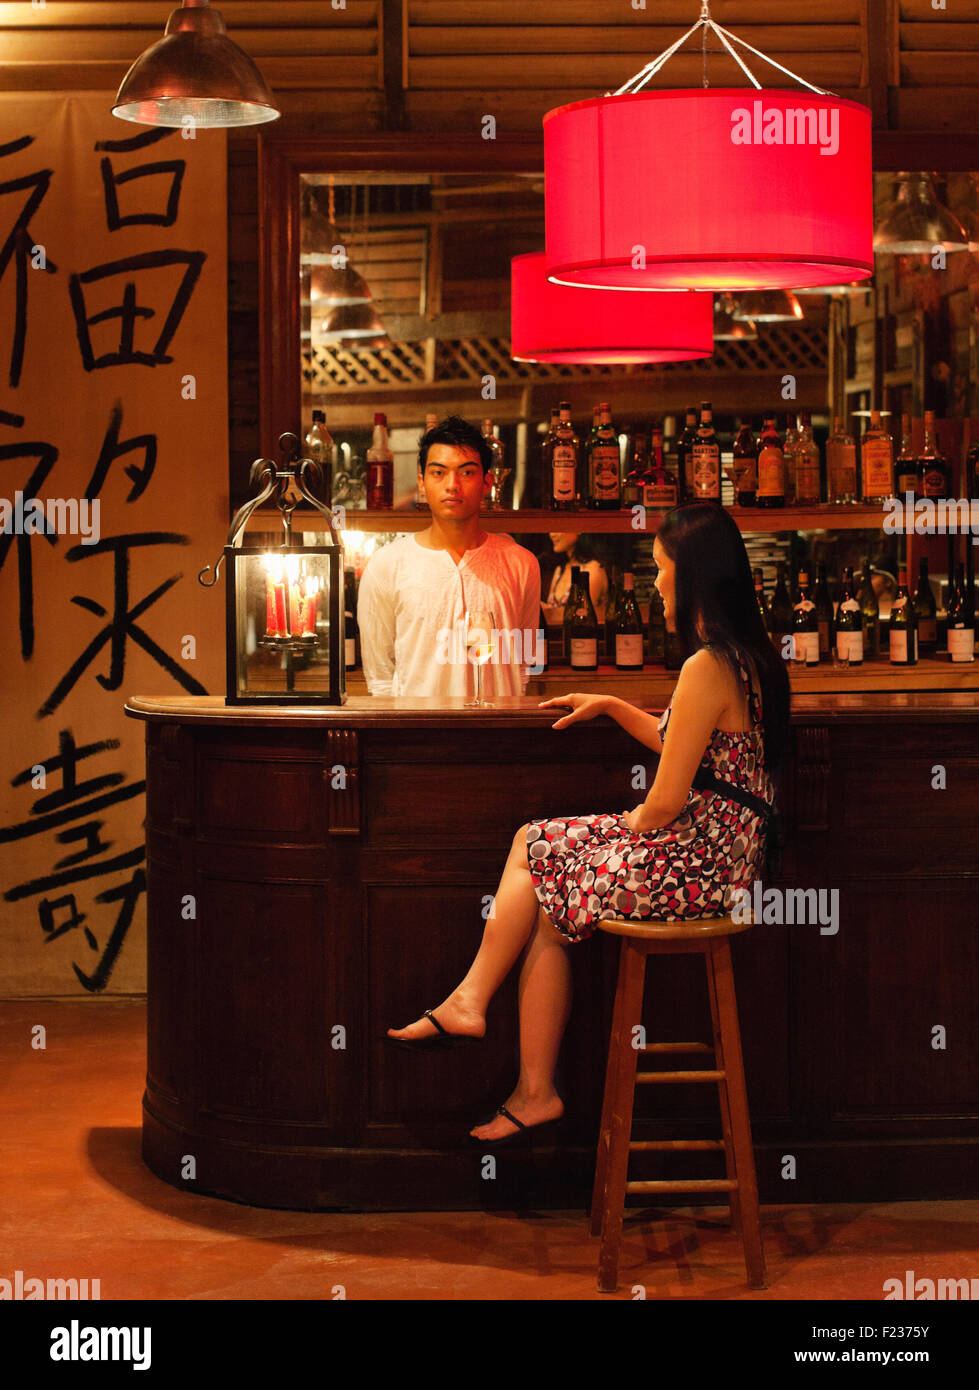 A woman drinks a cocktail at the Chin Chin Bar, Bon Ton Resort Langkawi, Malaysia. - Stock Image